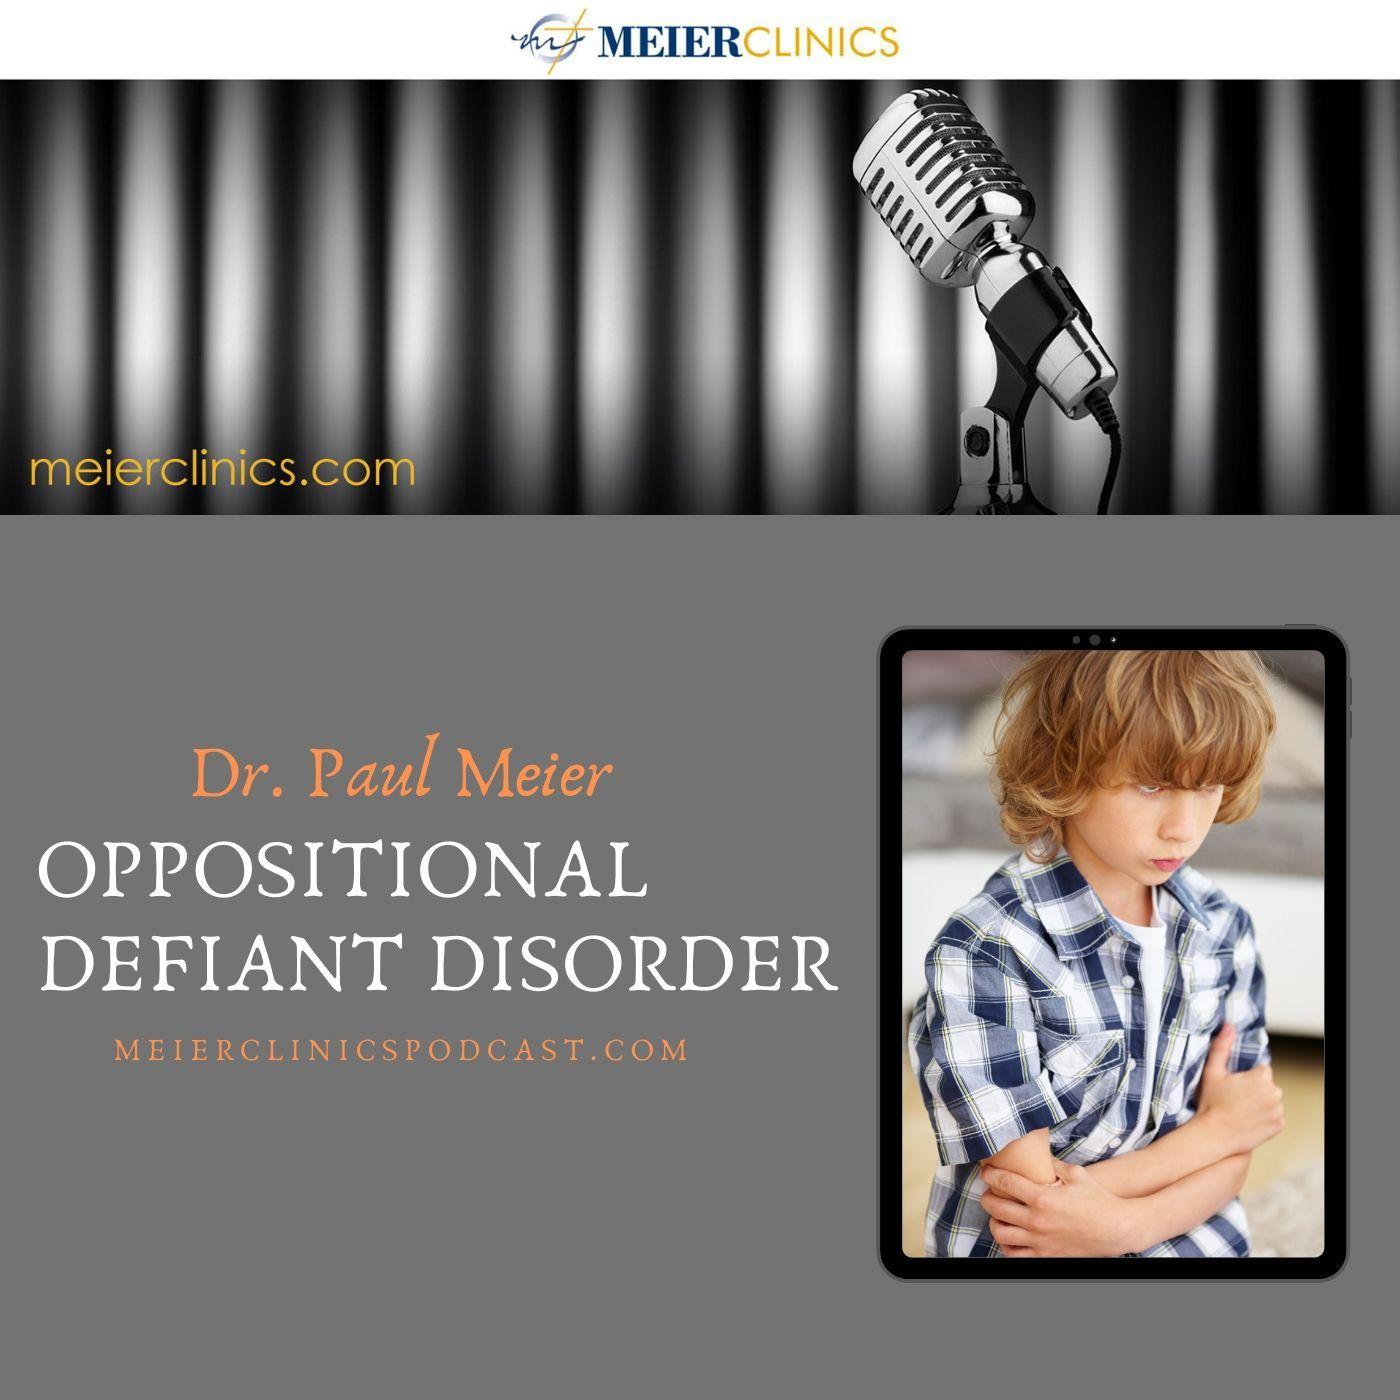 Oppositional Defiant Disorder with Dr. Paul Meier